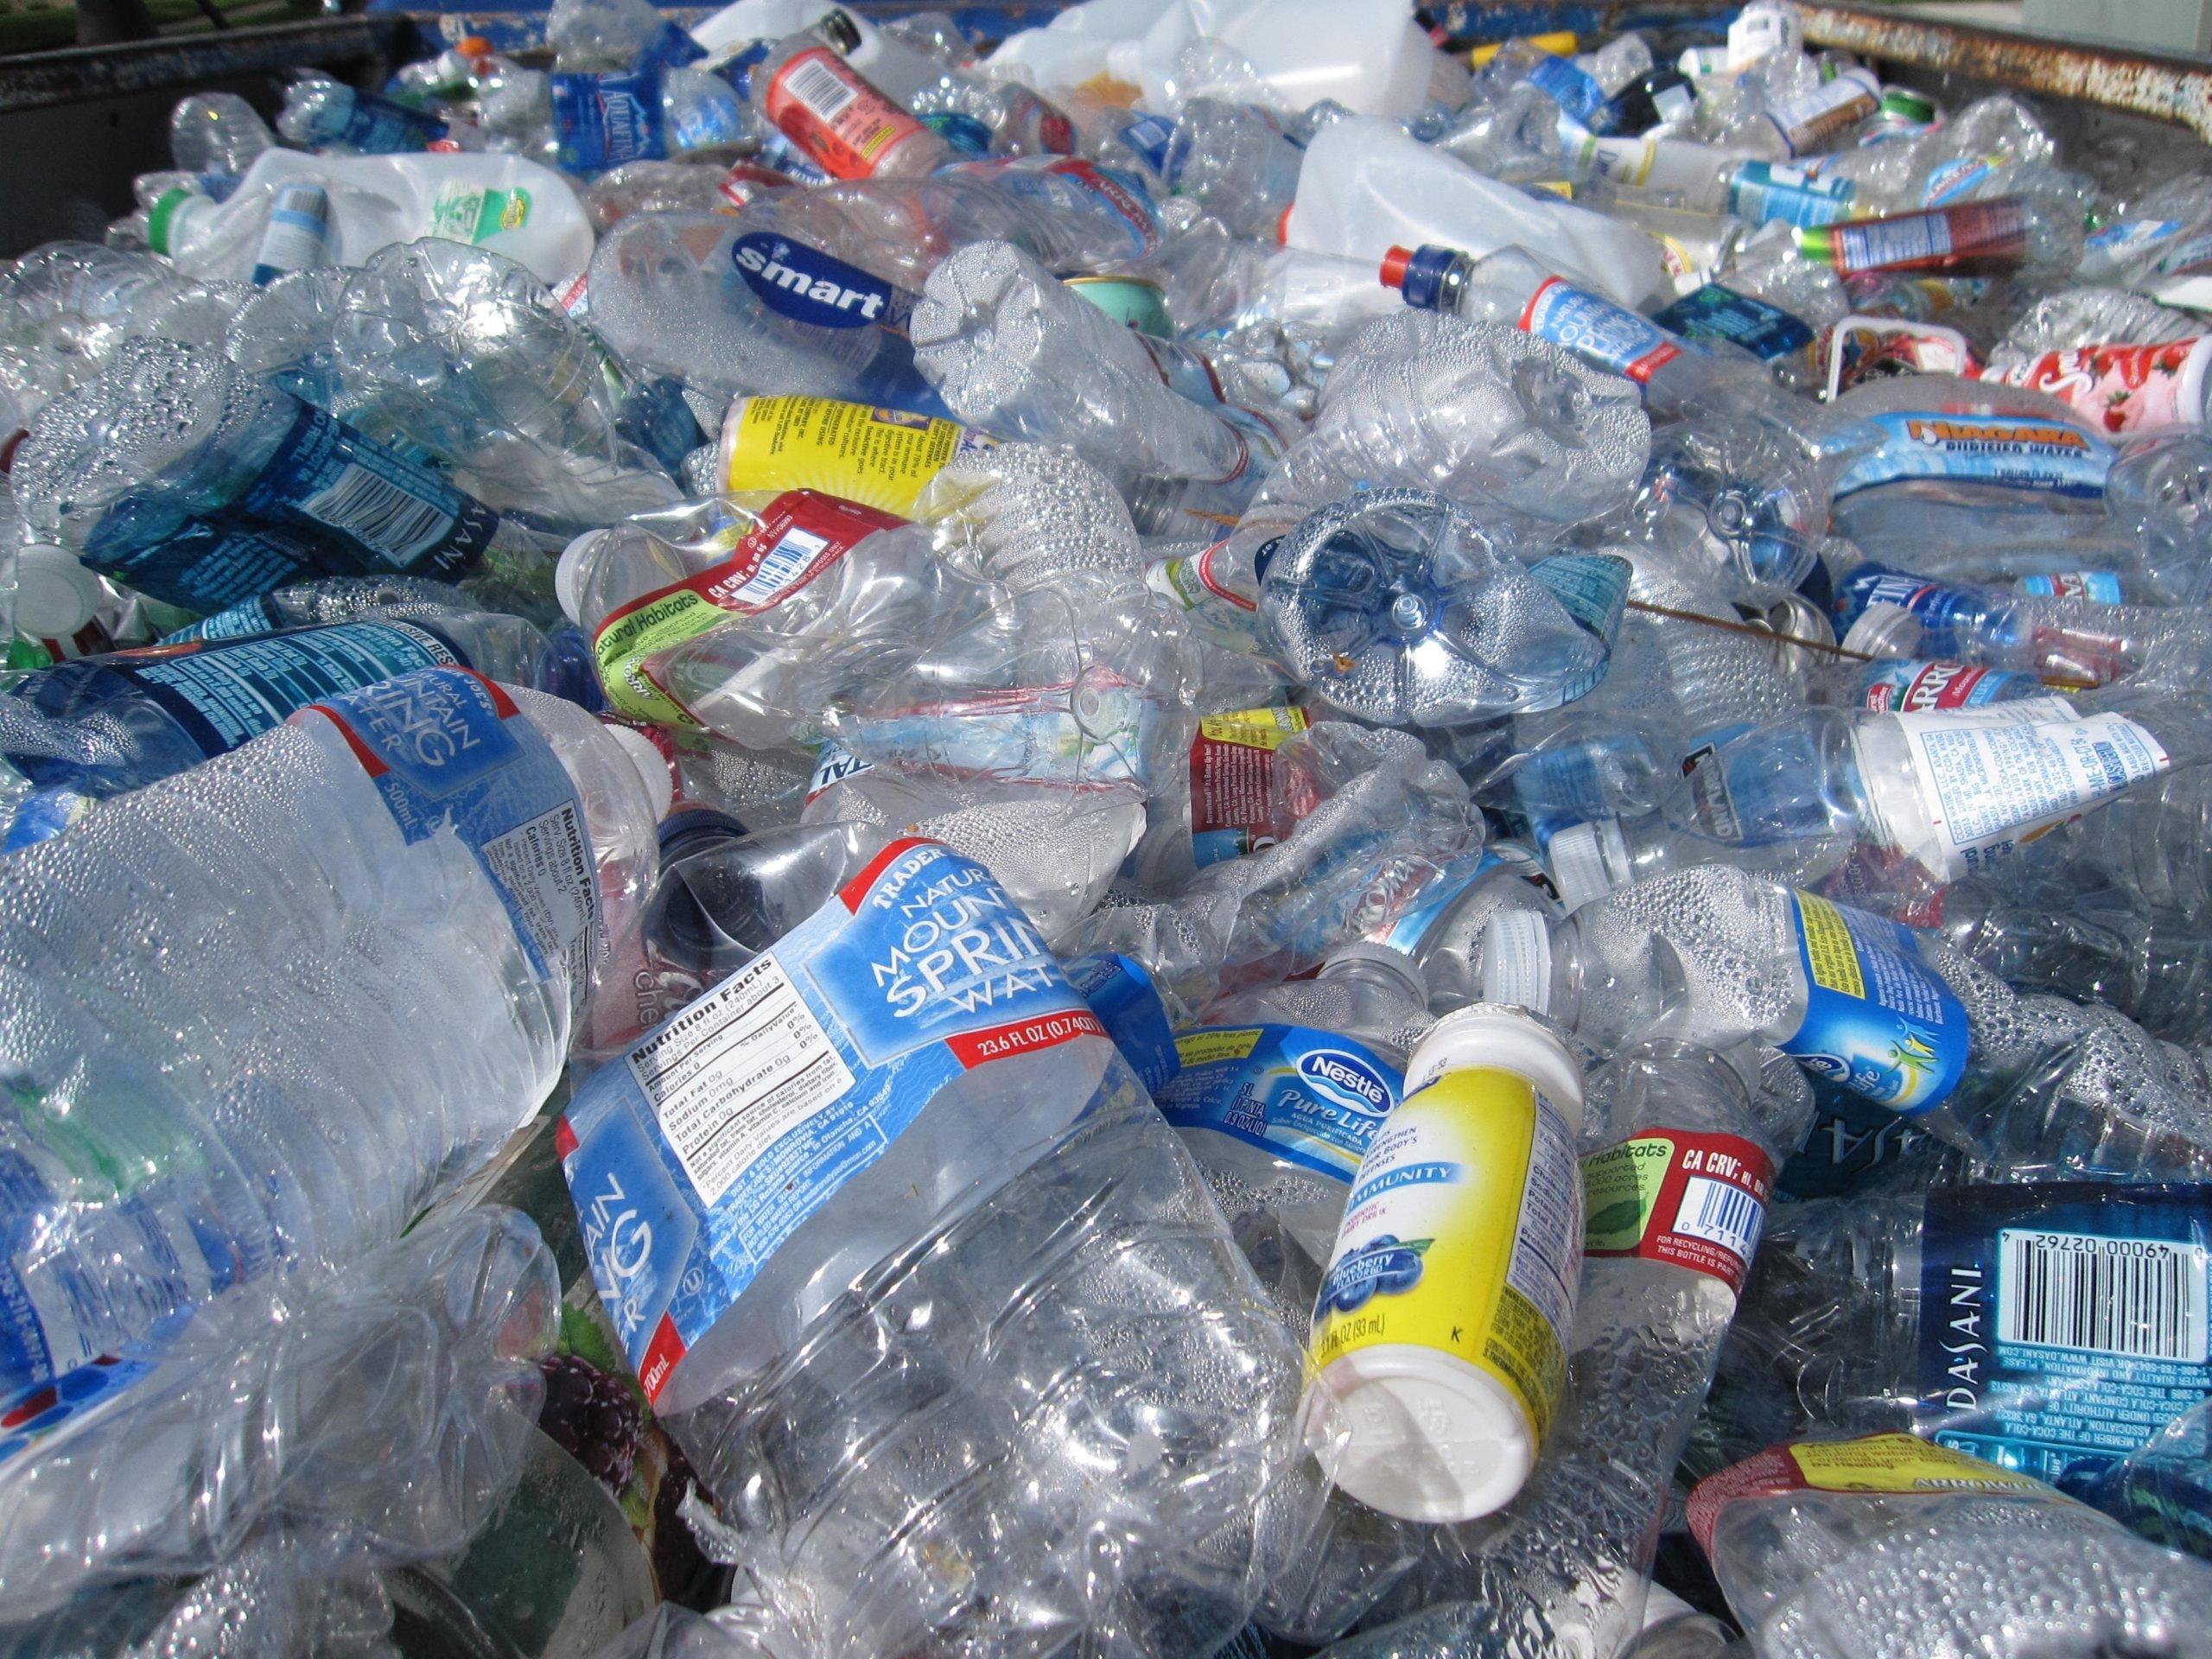 Plastic water bottle pollution